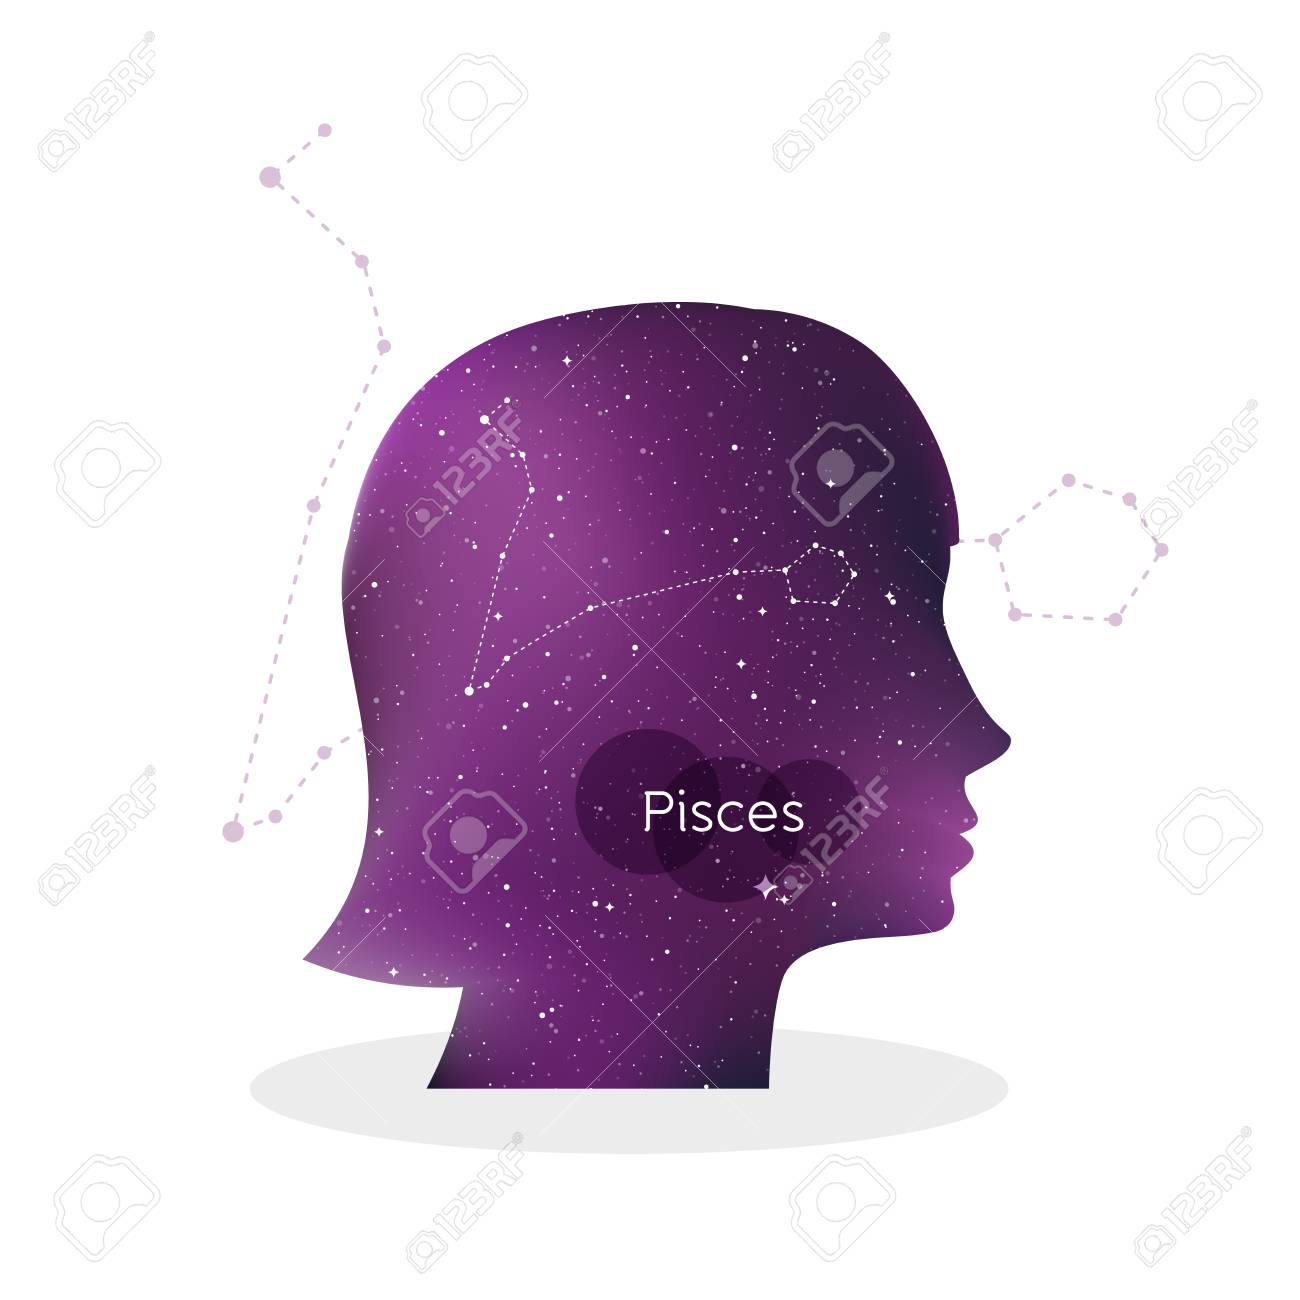 Pisces Zodiac Sign Woman Portrait In Profile Horoscope Symbol